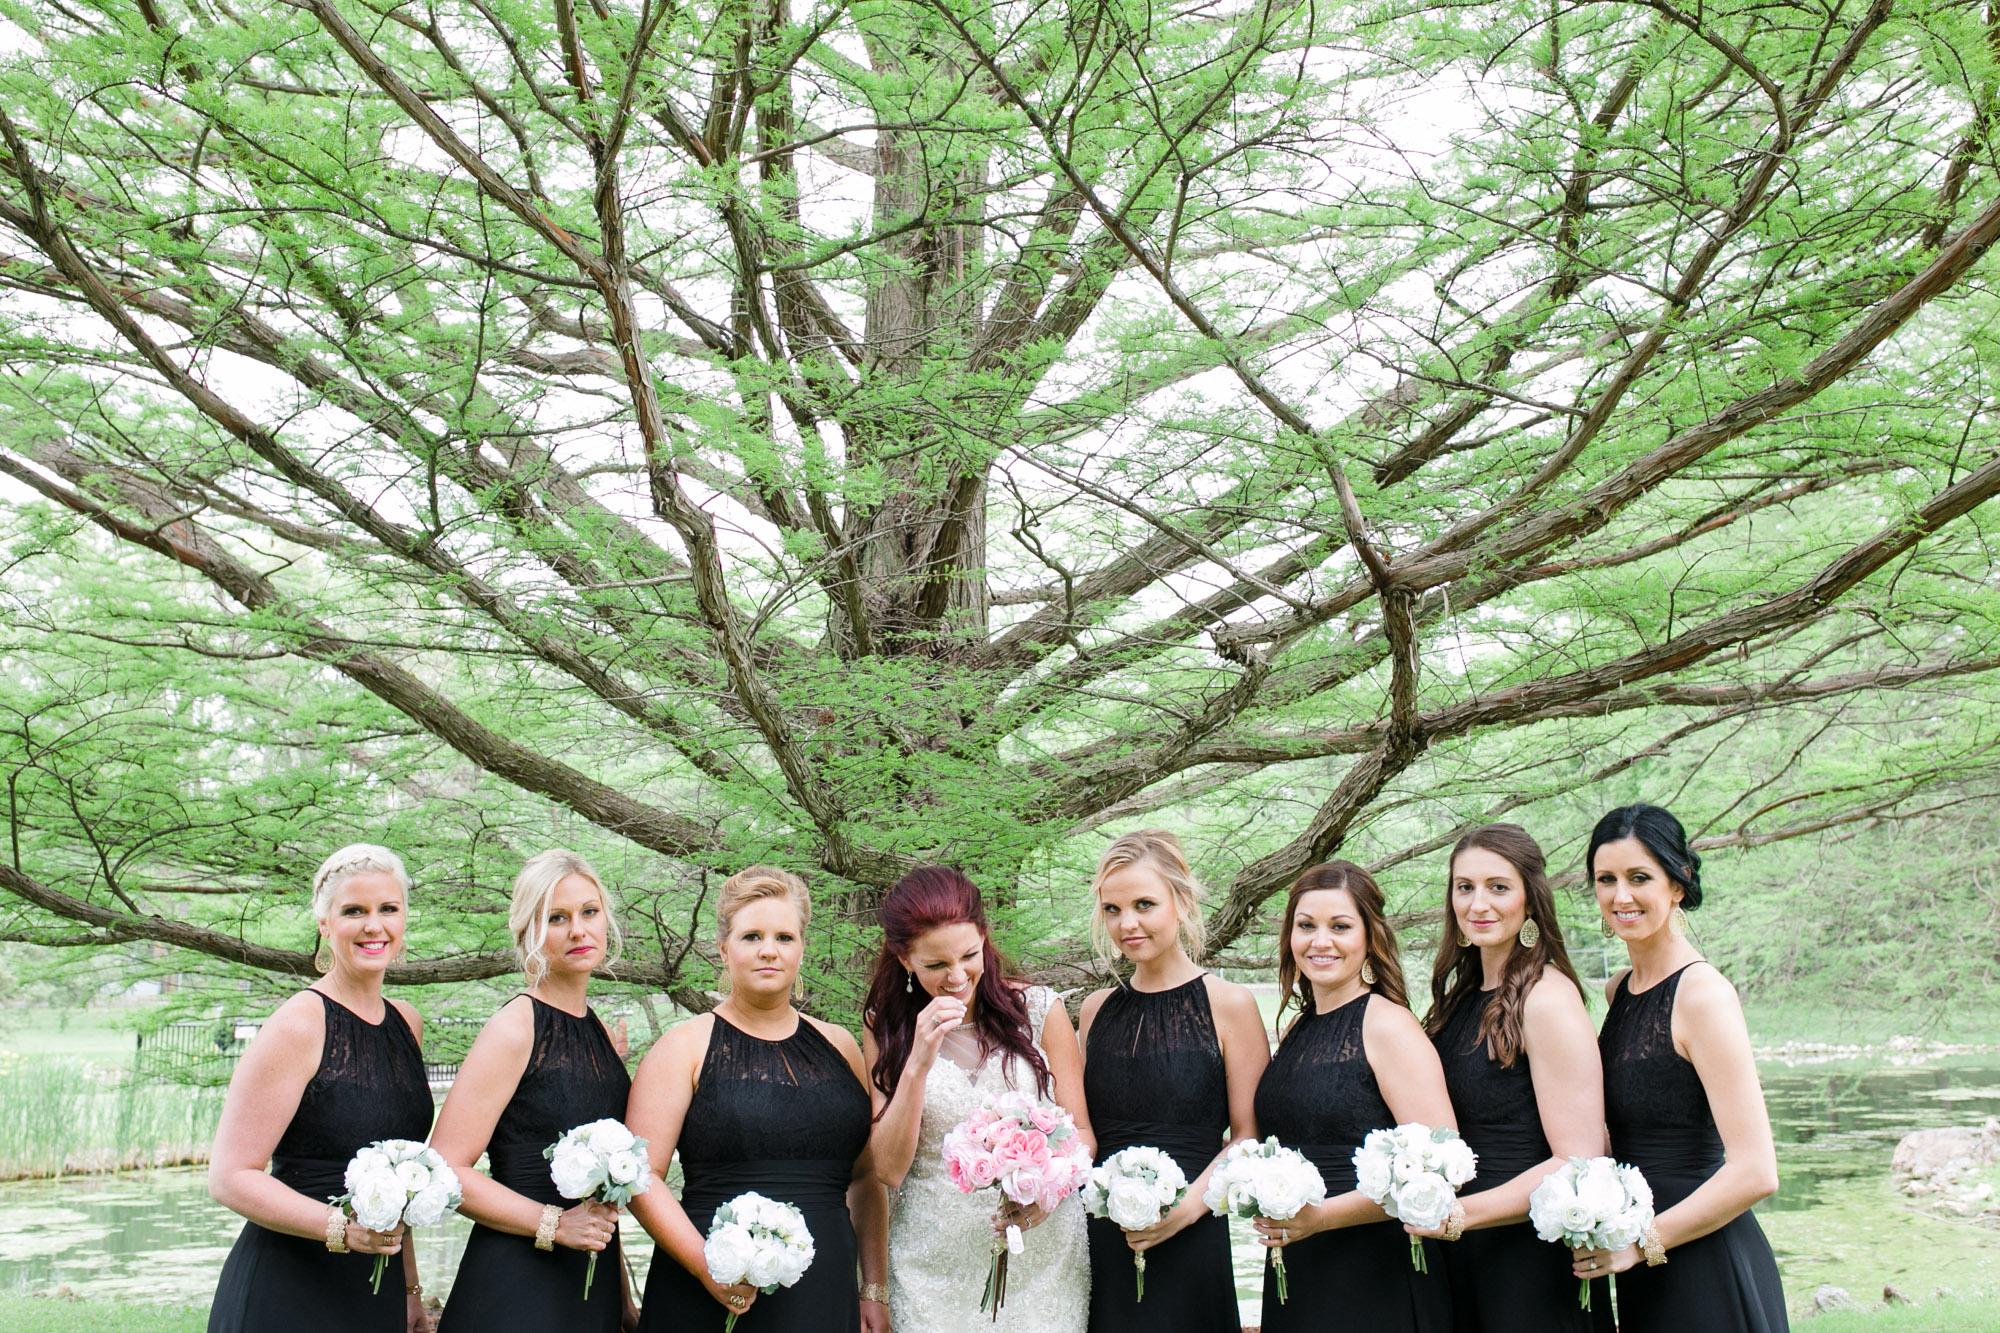 hensville-wedding-downtown-toledo-ohio (53 of 103).jpg